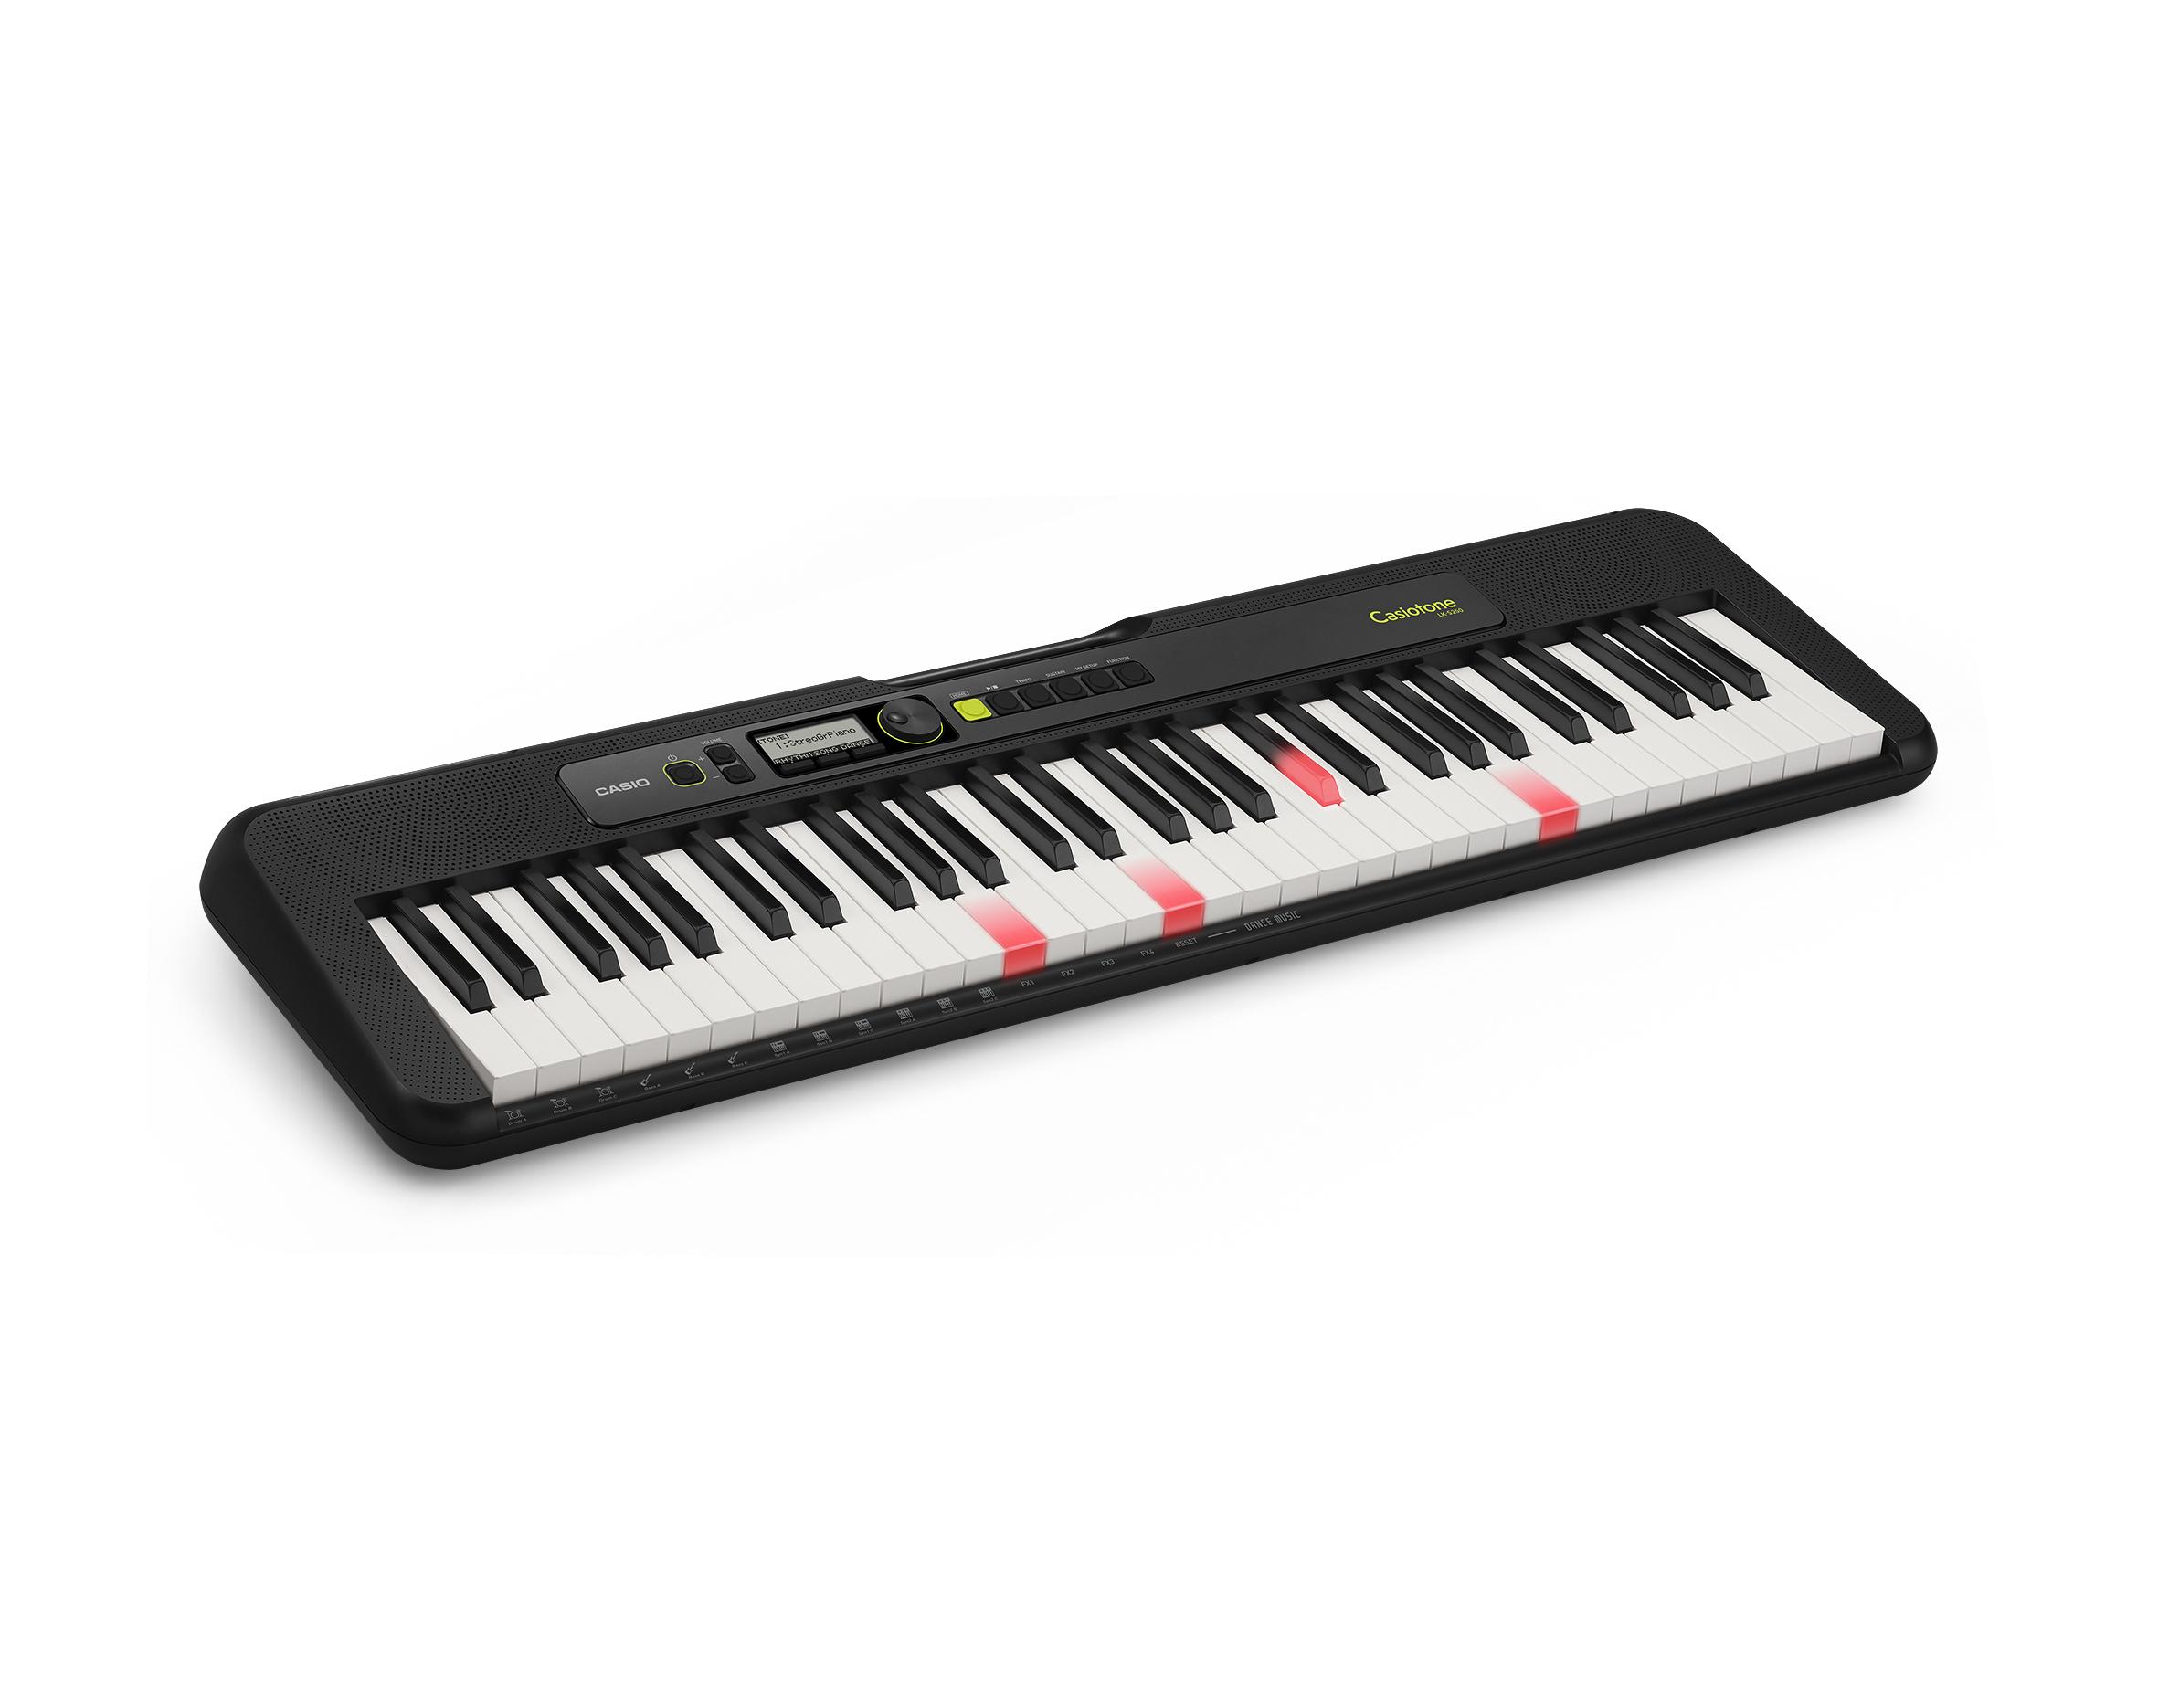 Casio LK-S250 Keyboard